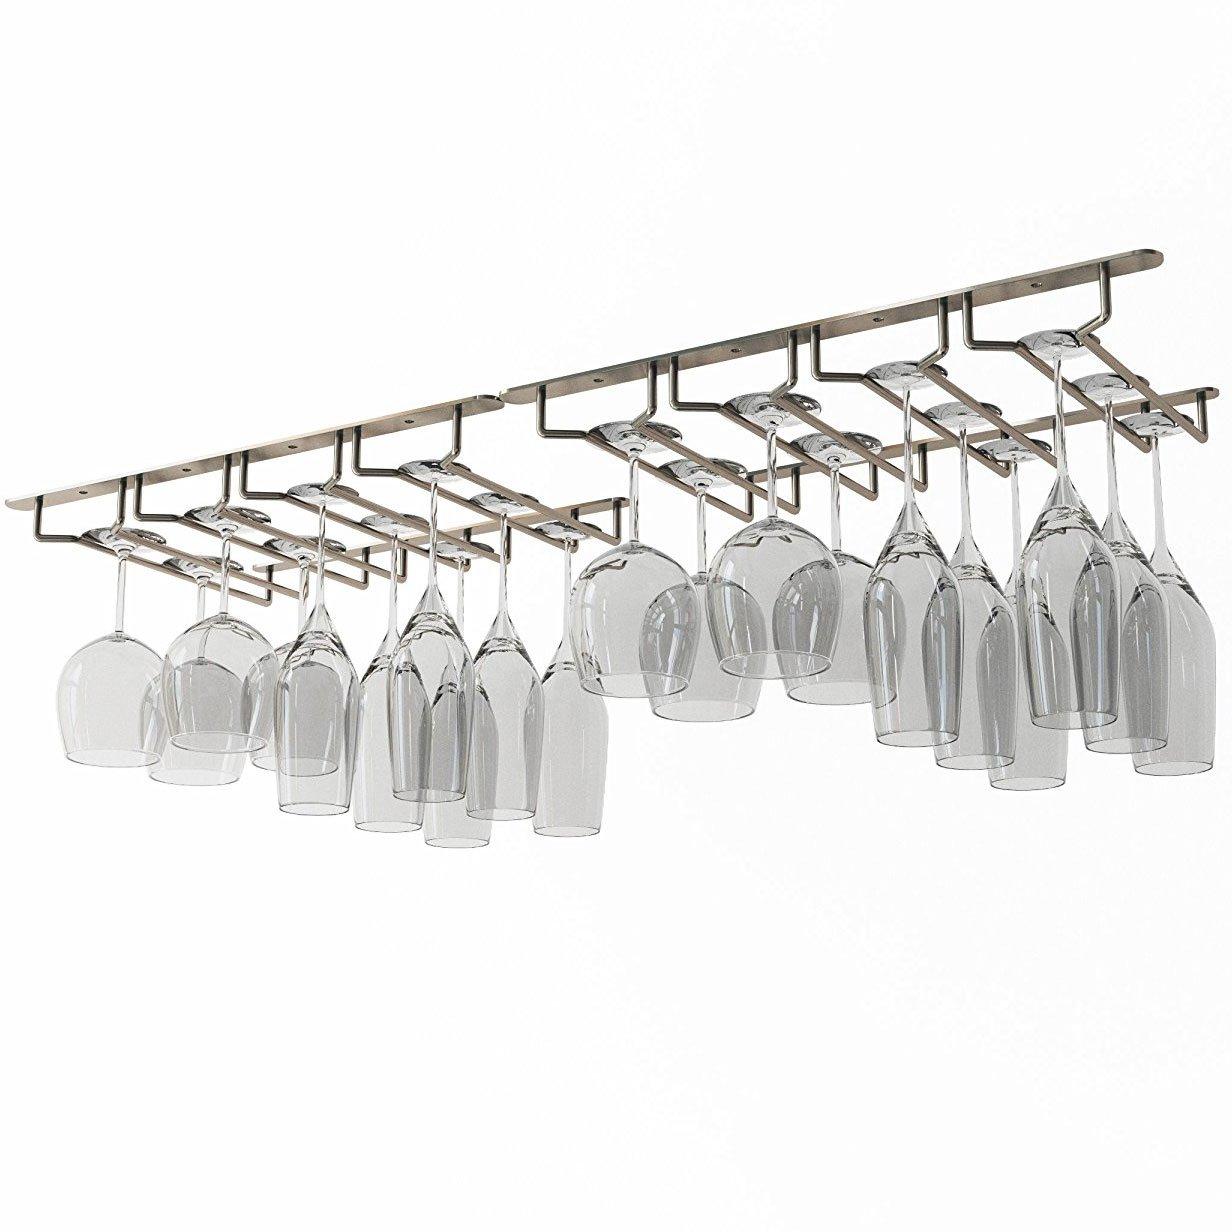 Wallniture Under Cabinet Stemware Glass Hanger Rack Kitchen or Bar Storage Oil Rubbed 10 Inch Deep Set of 2